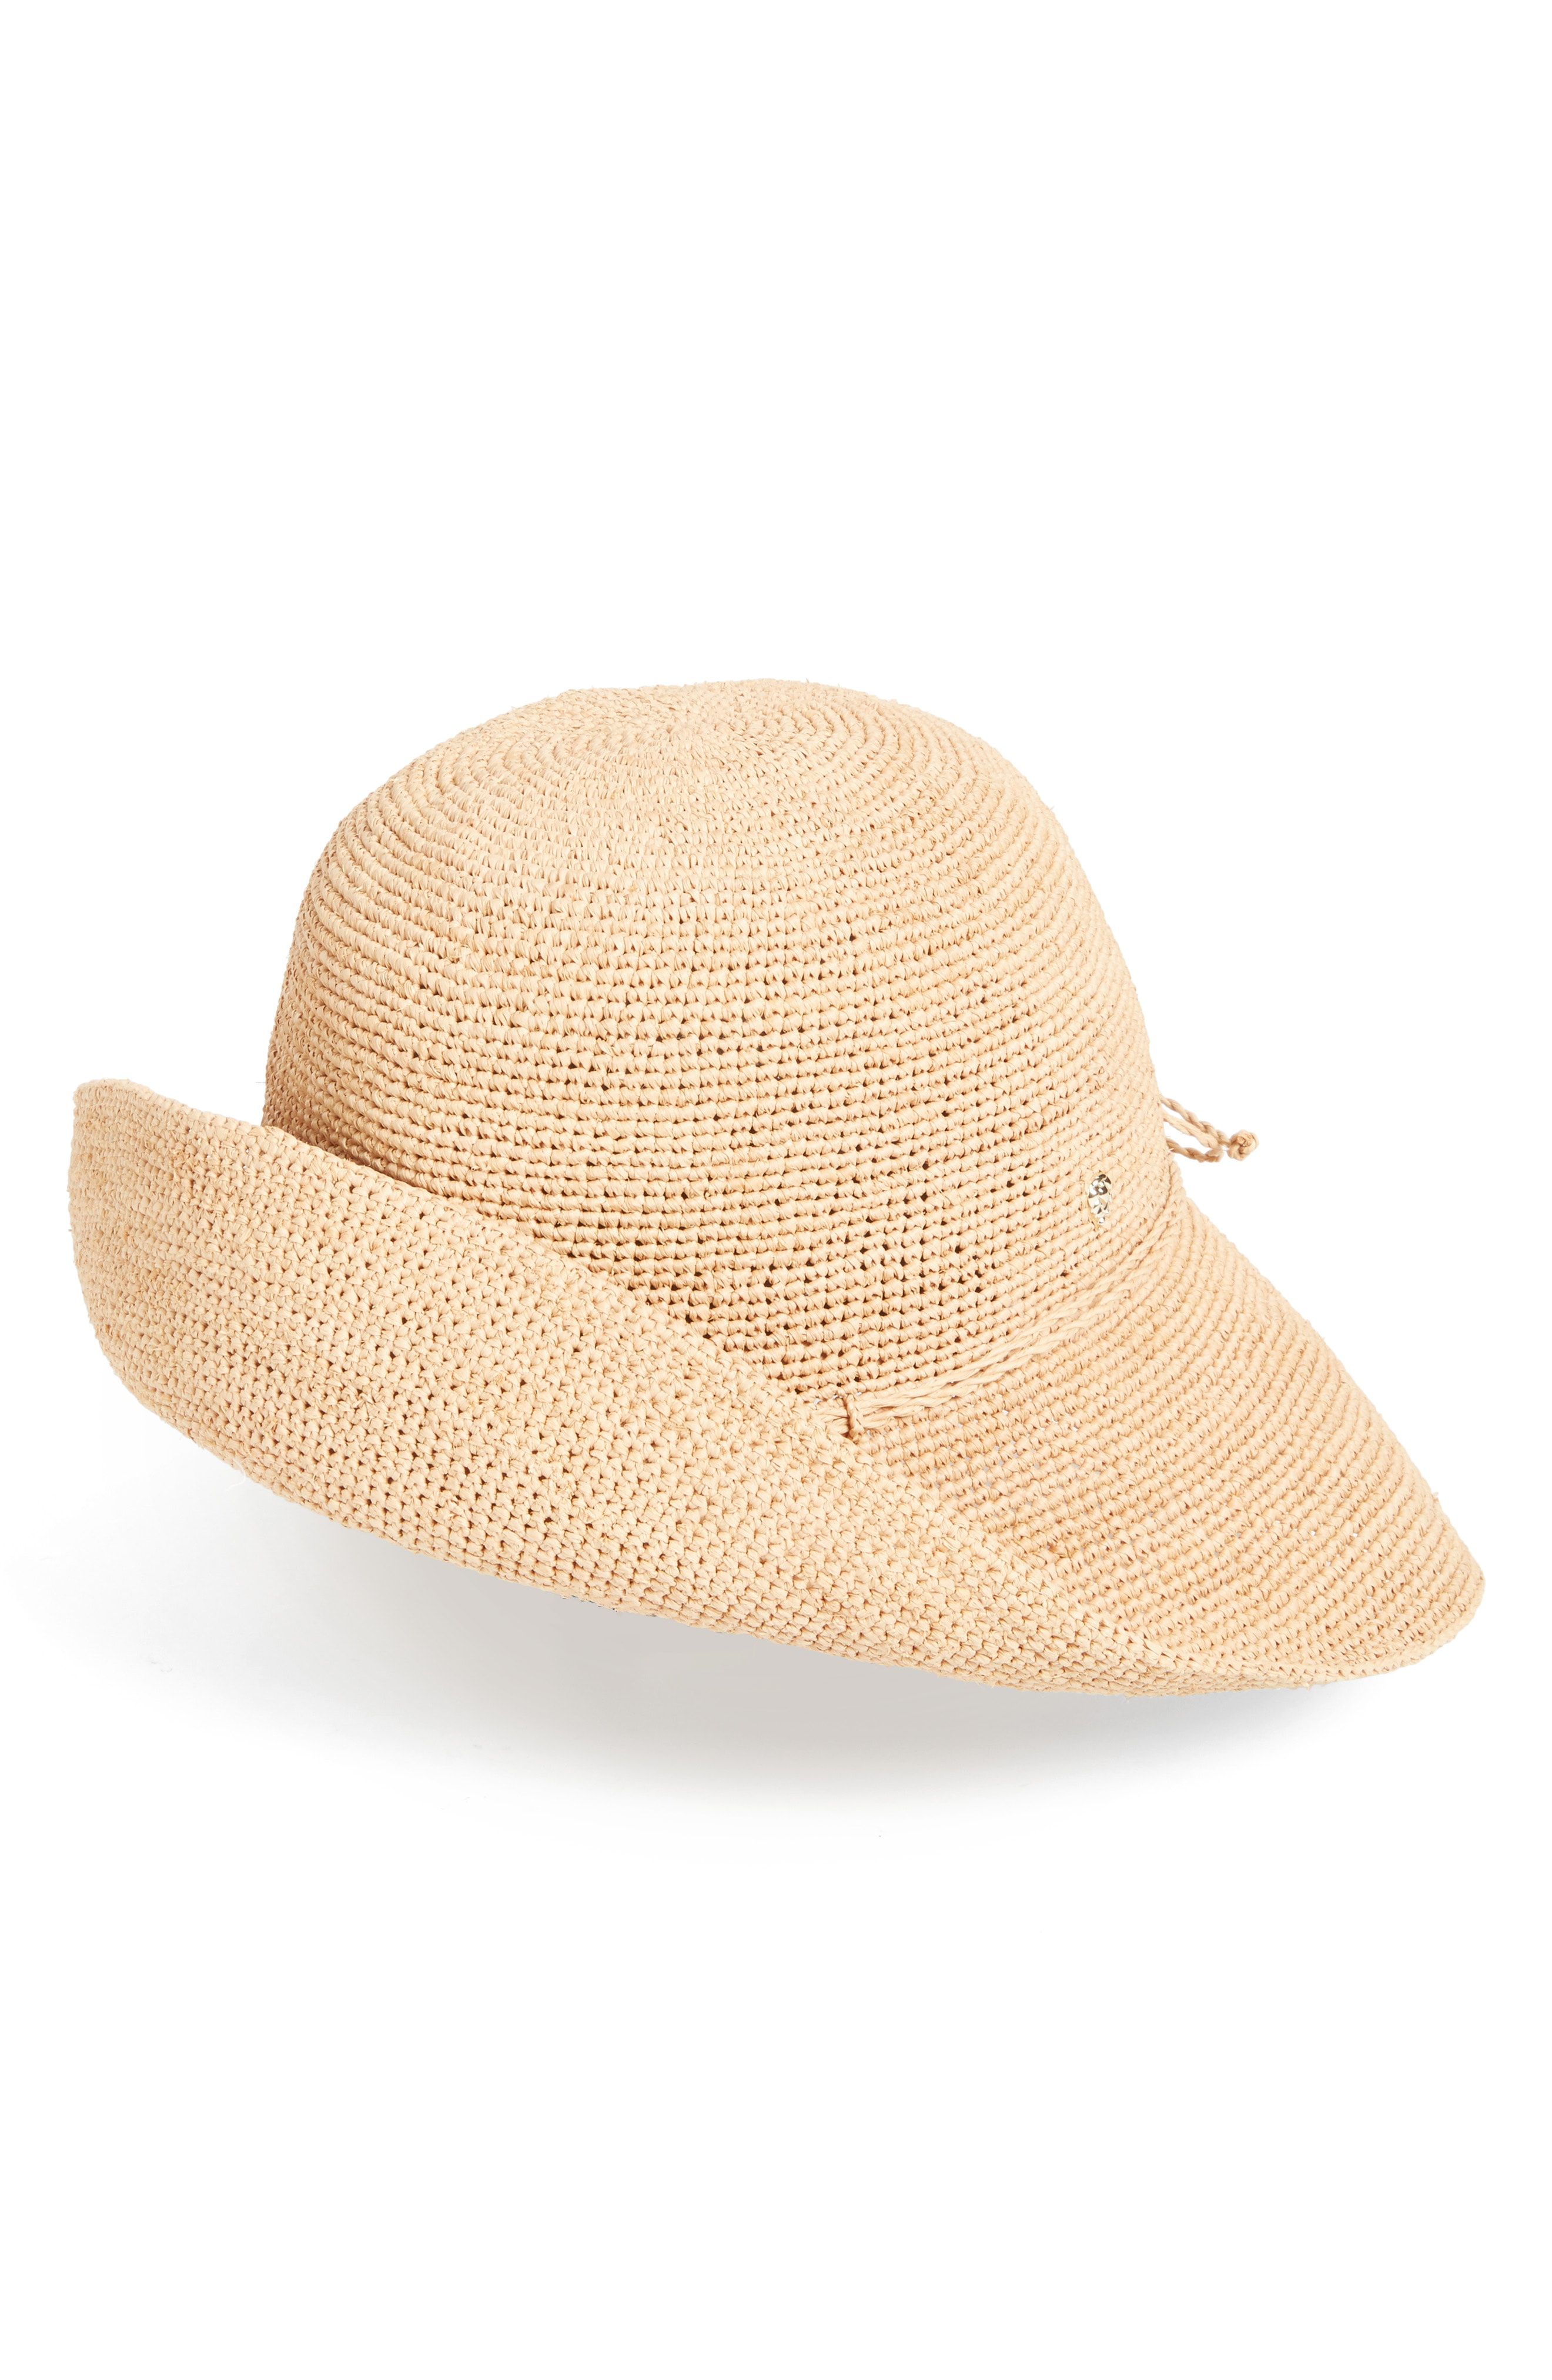 273b93298e41b Helen Kaminski  Provence 10  Packable Raffia Hat - Brown In Nougat ...